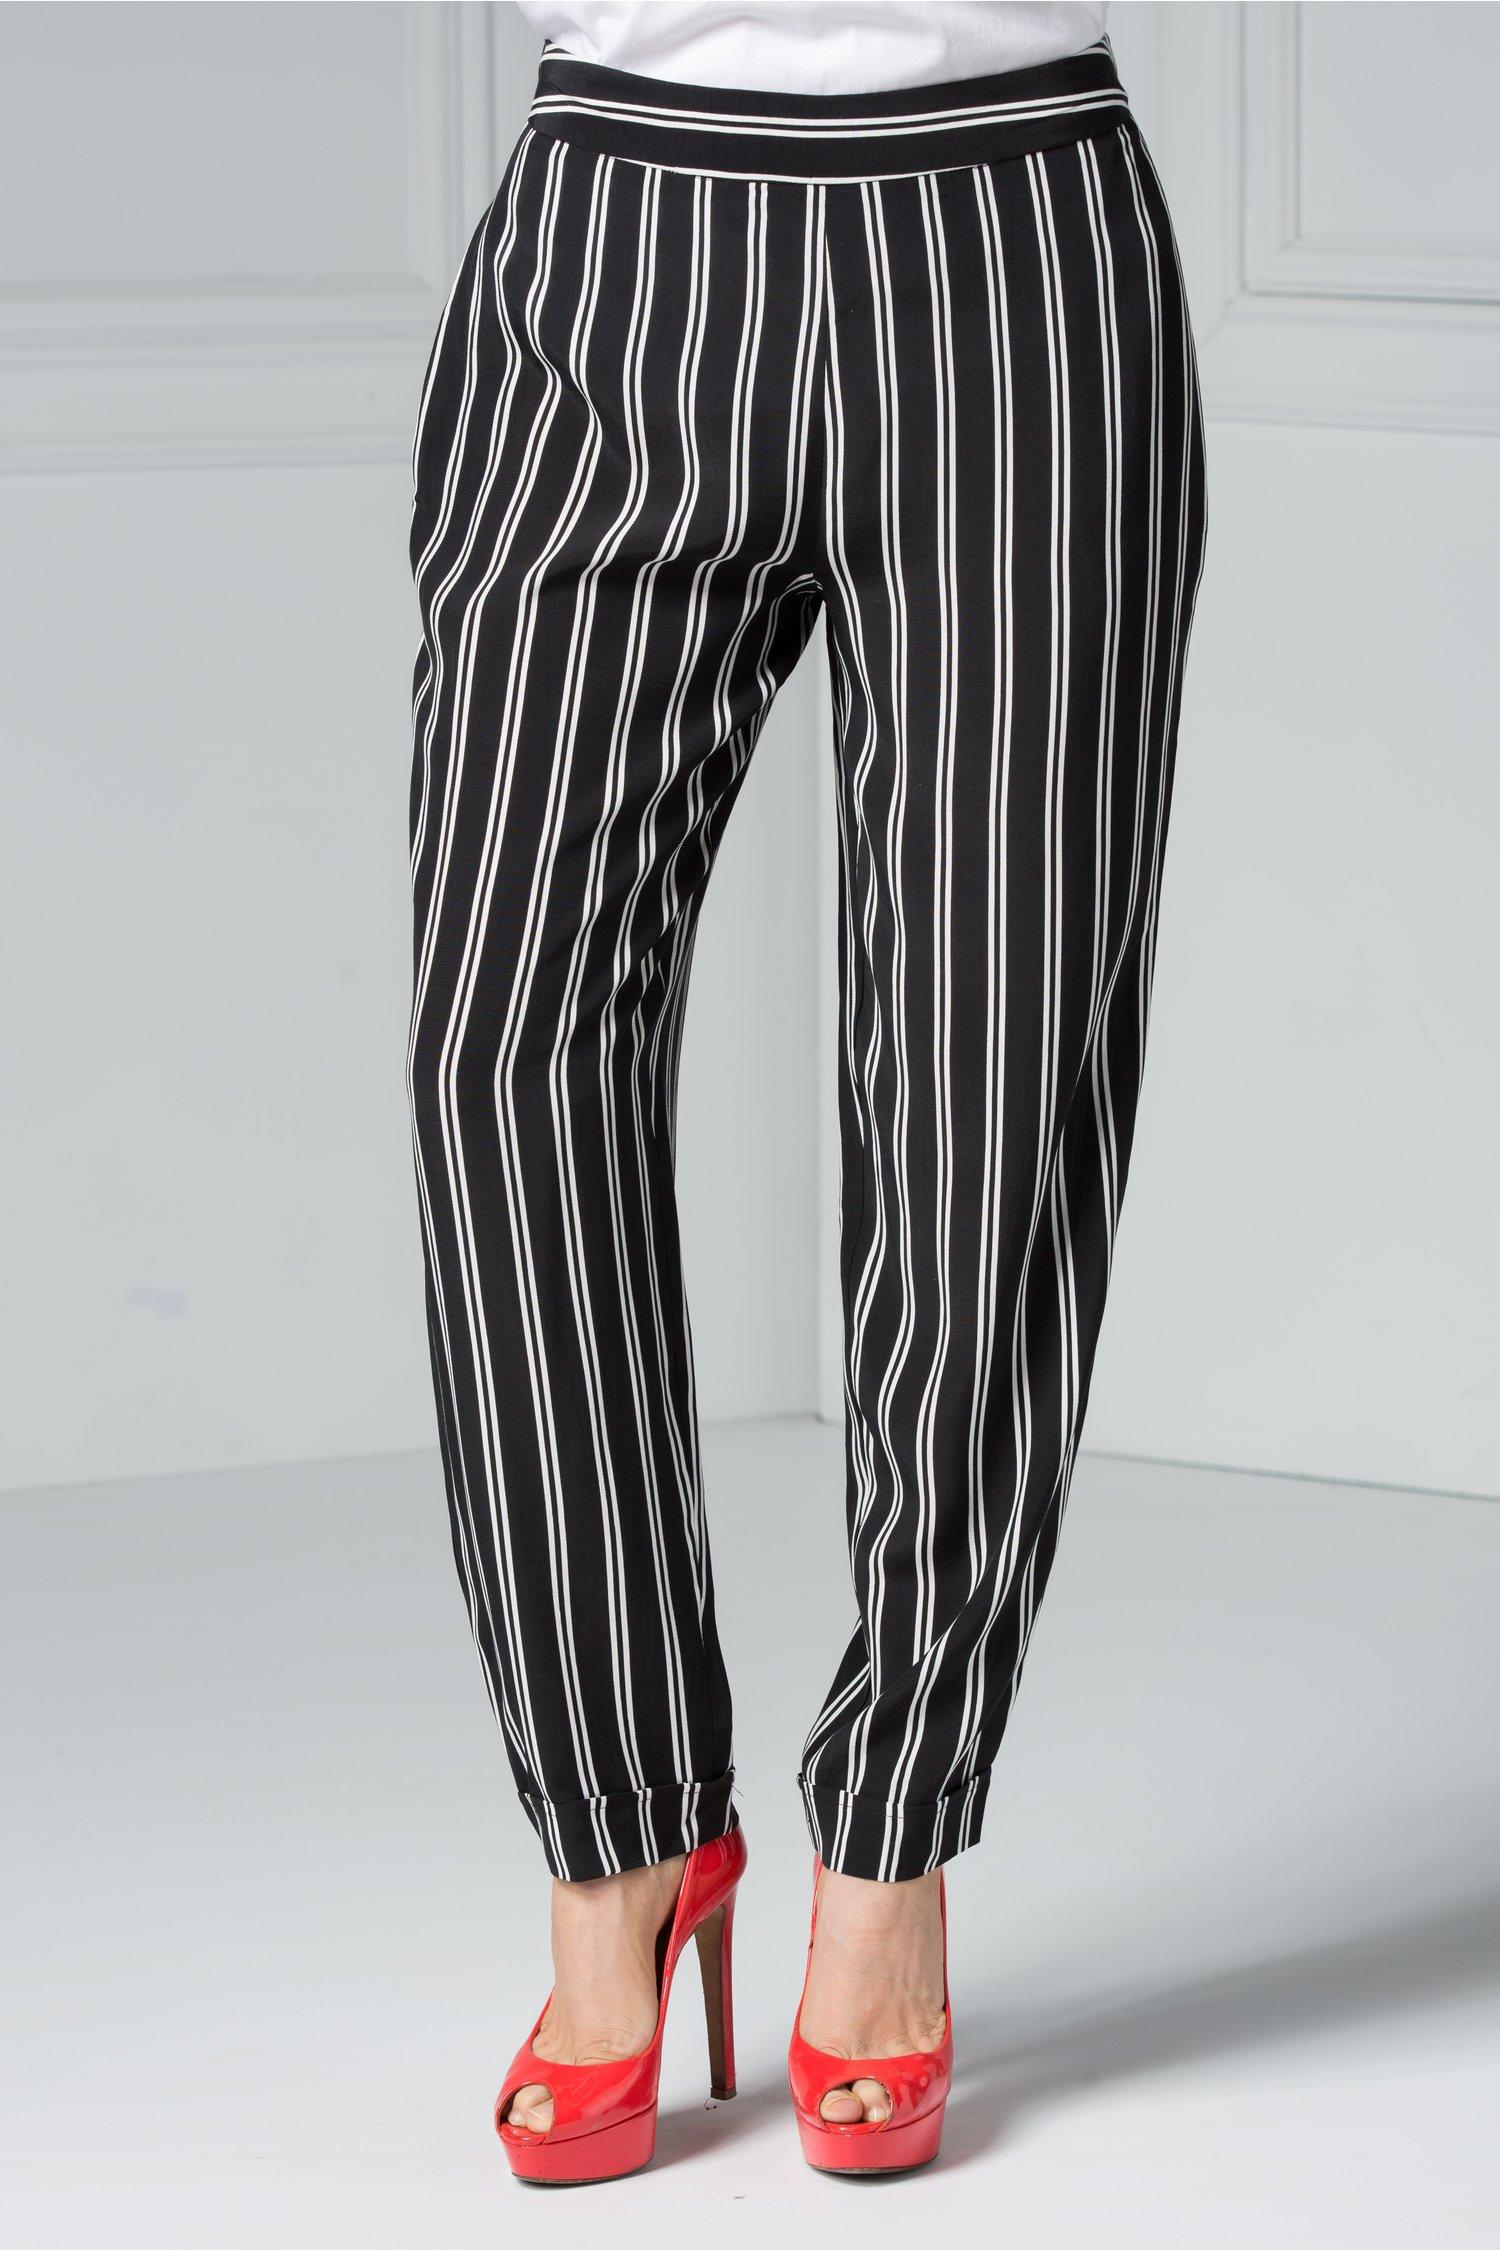 Pantalon Brise Kira negru cu dungi albe office eleganti.